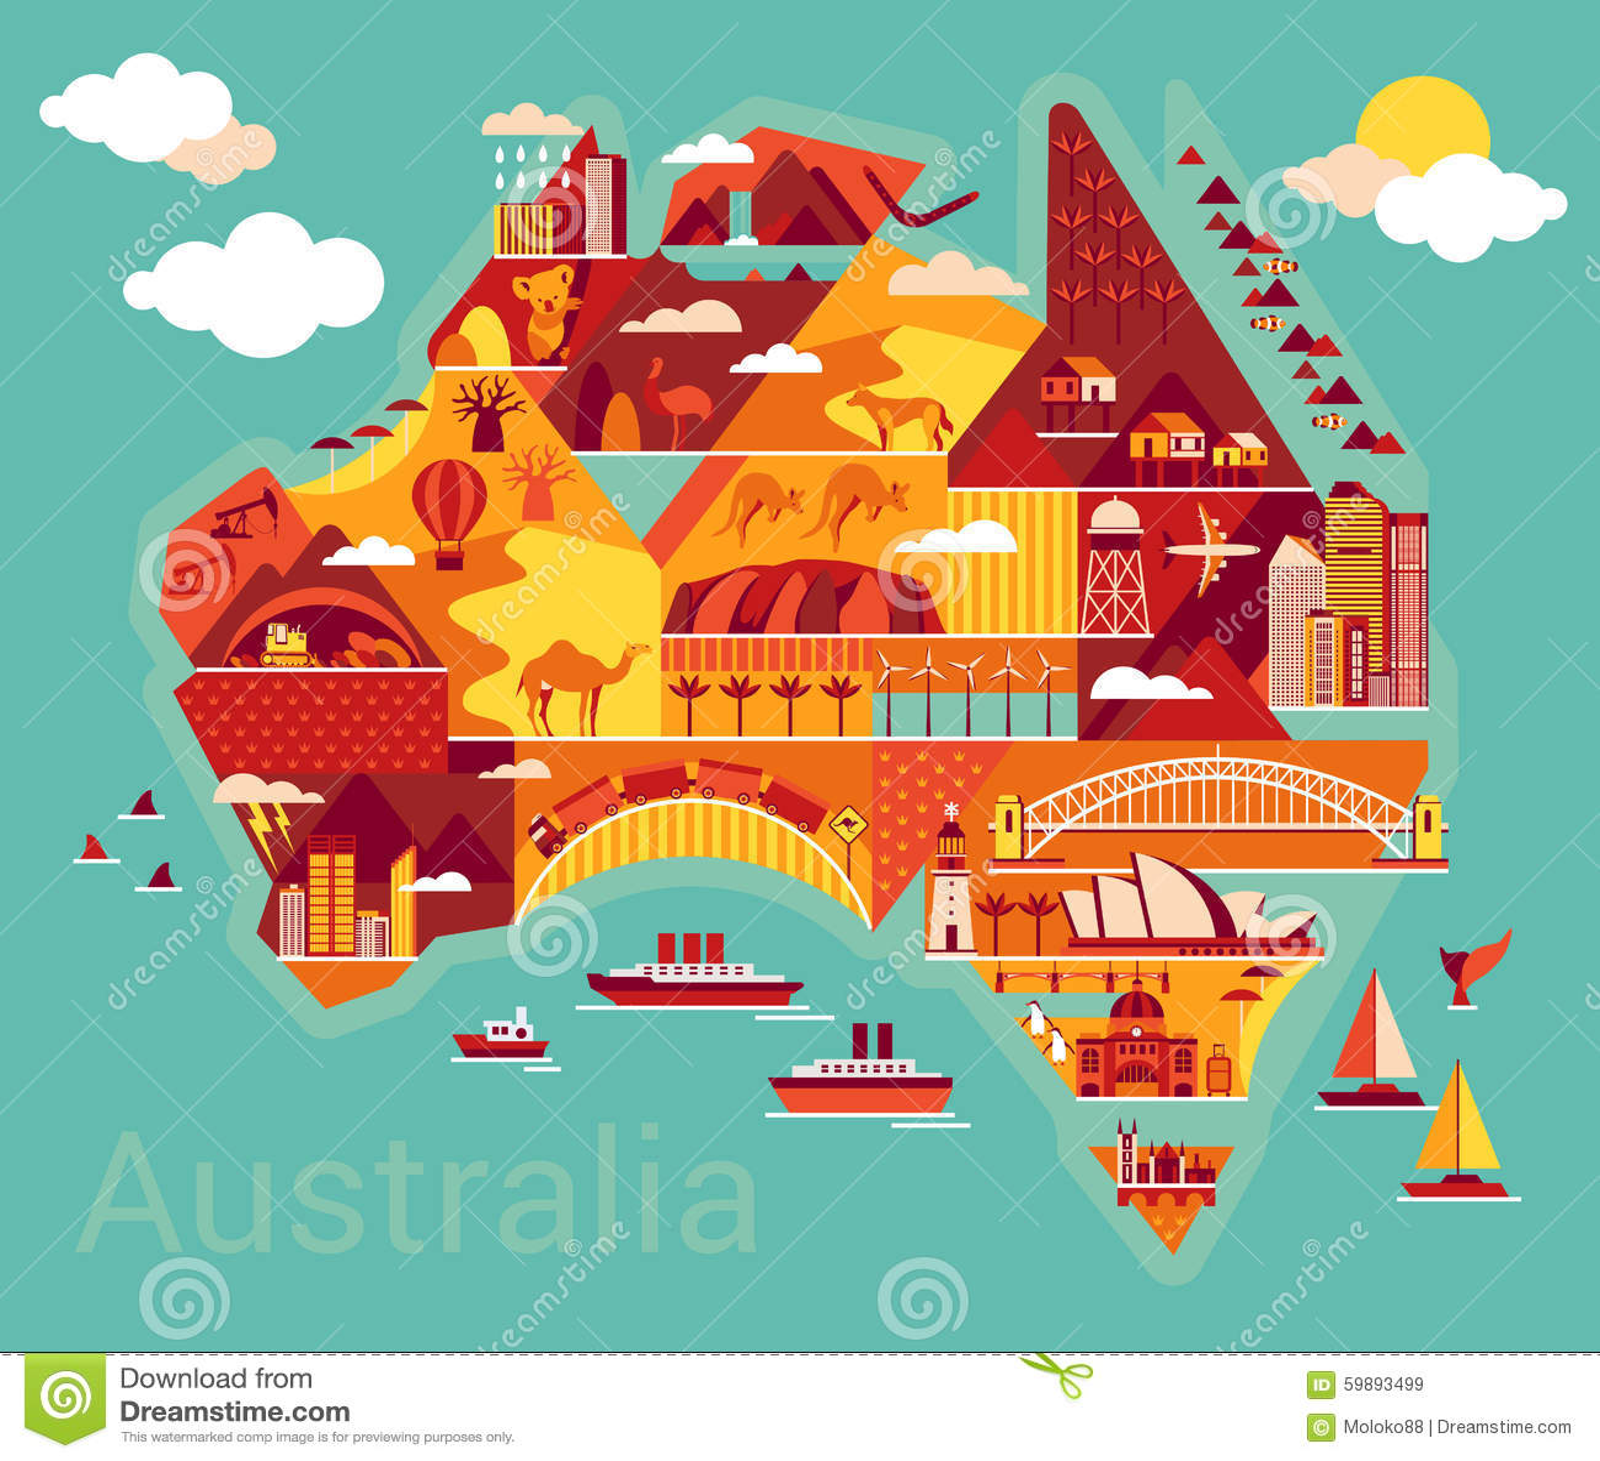 Map Of Australian Landscapes.Cartoon Map Of Australia Stock Vector Illustration Of Countryside